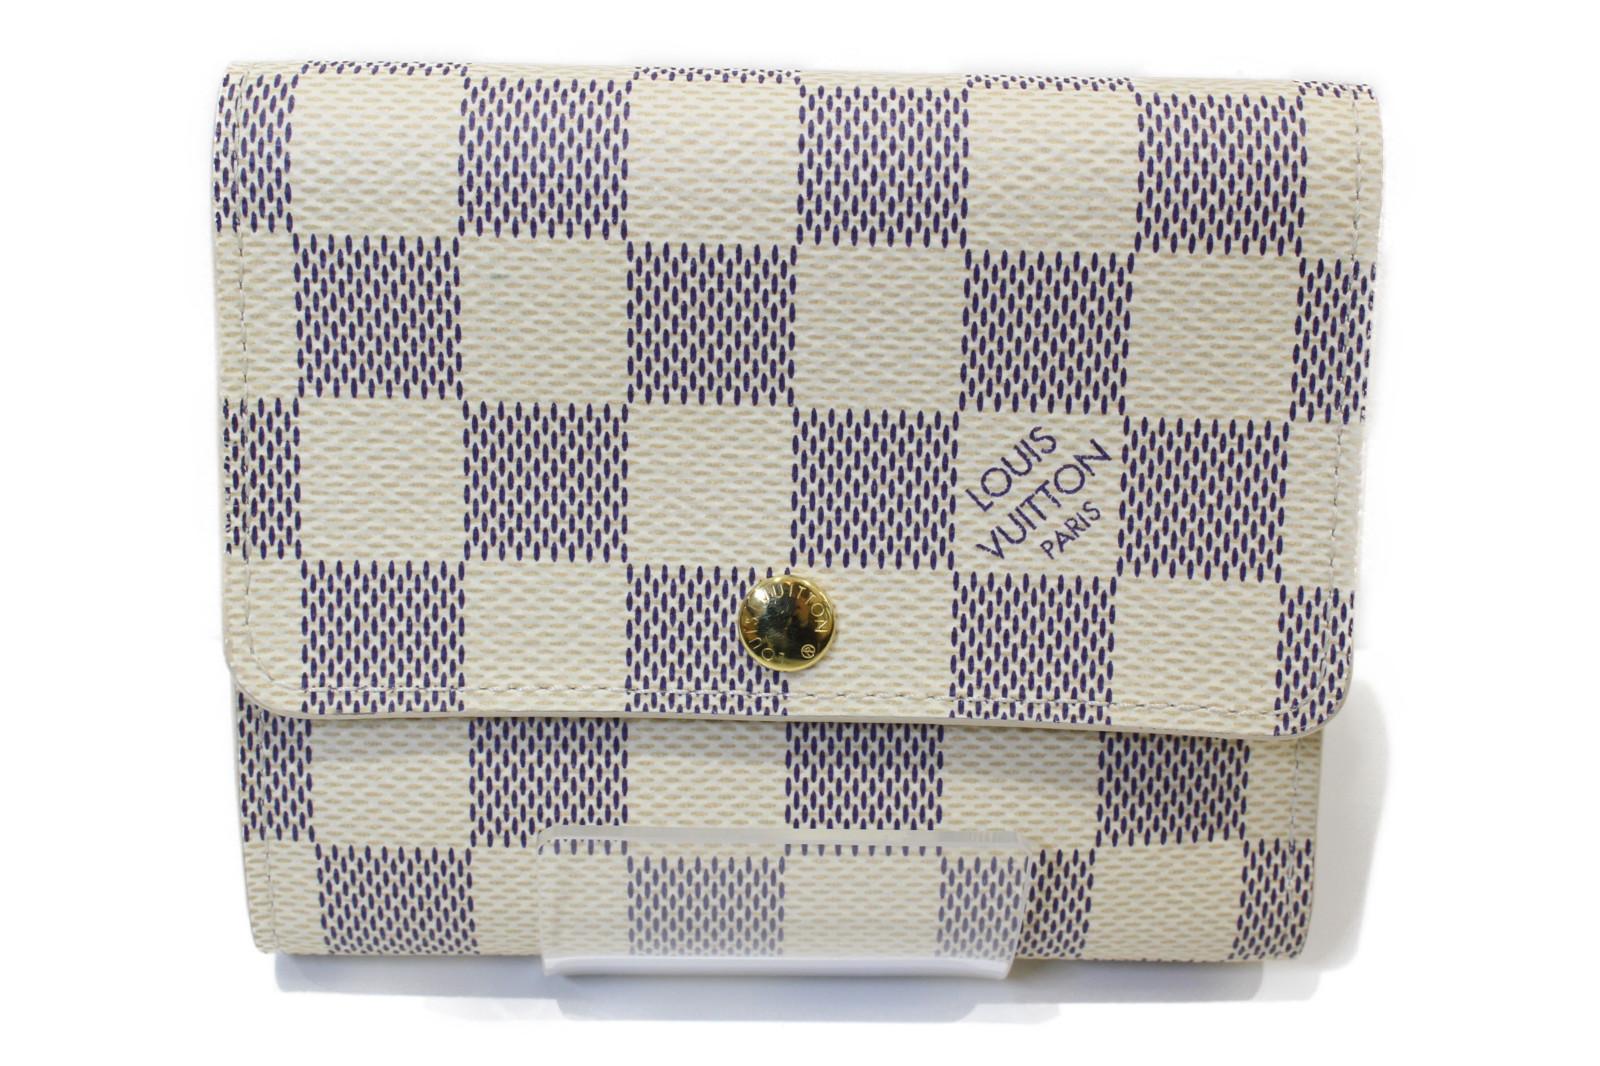 LOUIS VUITTON ルイヴィトンポルトフォイユアナイス N63241ダミエ・アズール 2つ折り財布コンパクトウォレットプレゼント包装可 【中古】